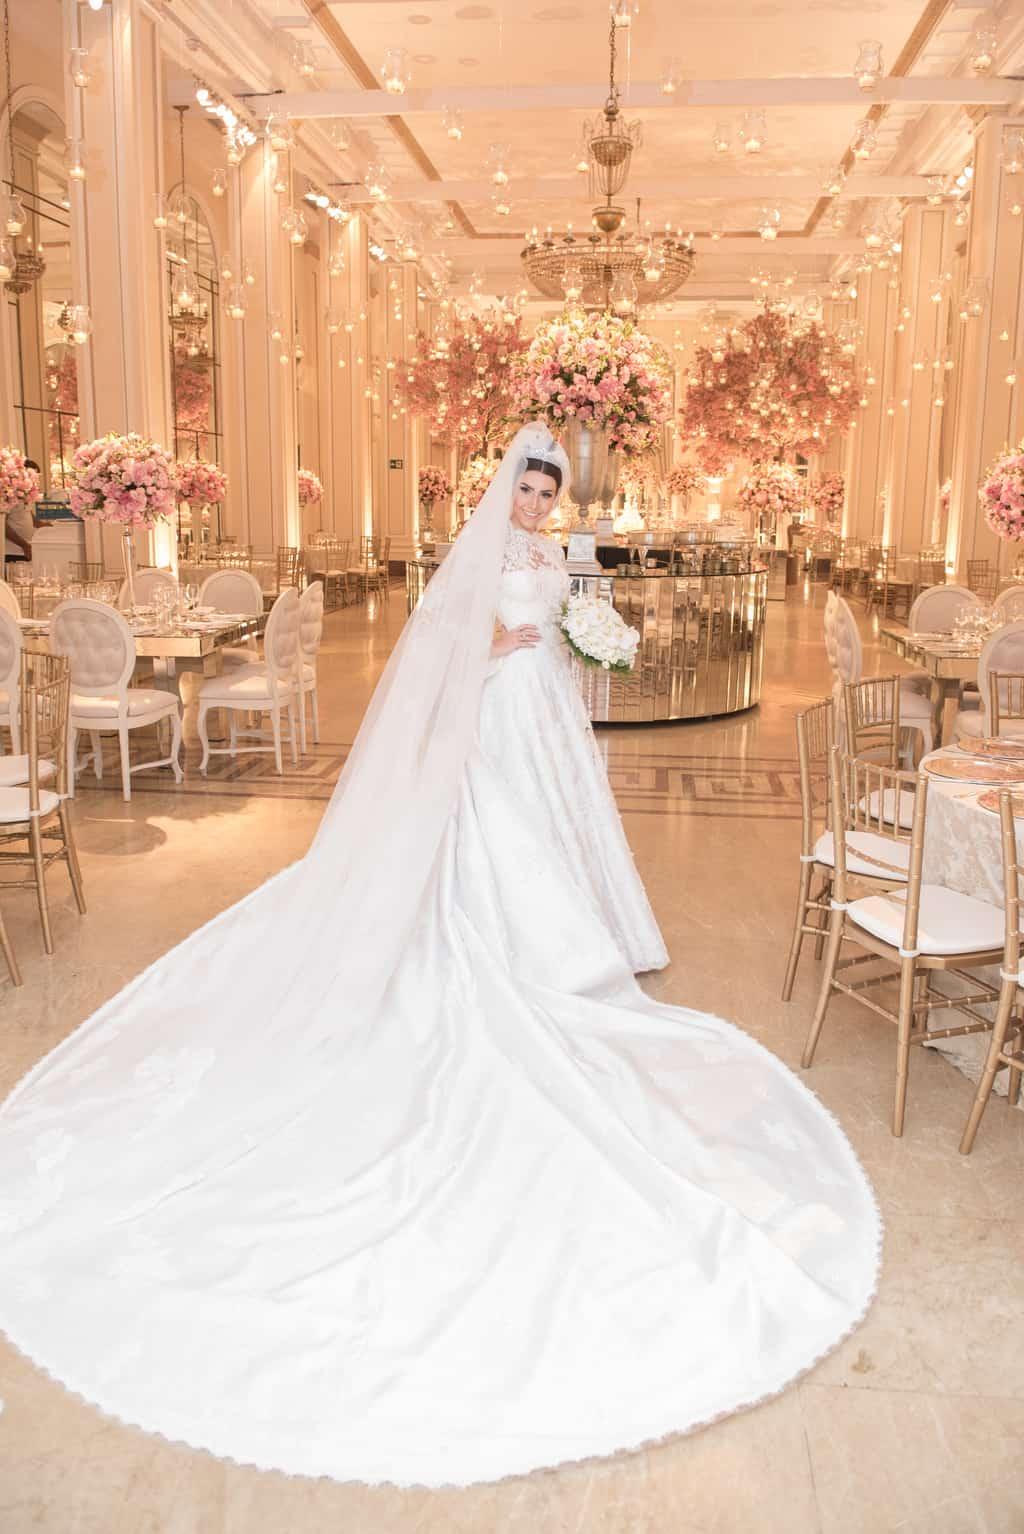 casamento-Patricia-e-Thiago-Copacabana-Palace-Marcelo-Hicho-Paula-Rocha-Marina-Fava-Making-Of0433-Patricia-e-Thiago-MFF_0698